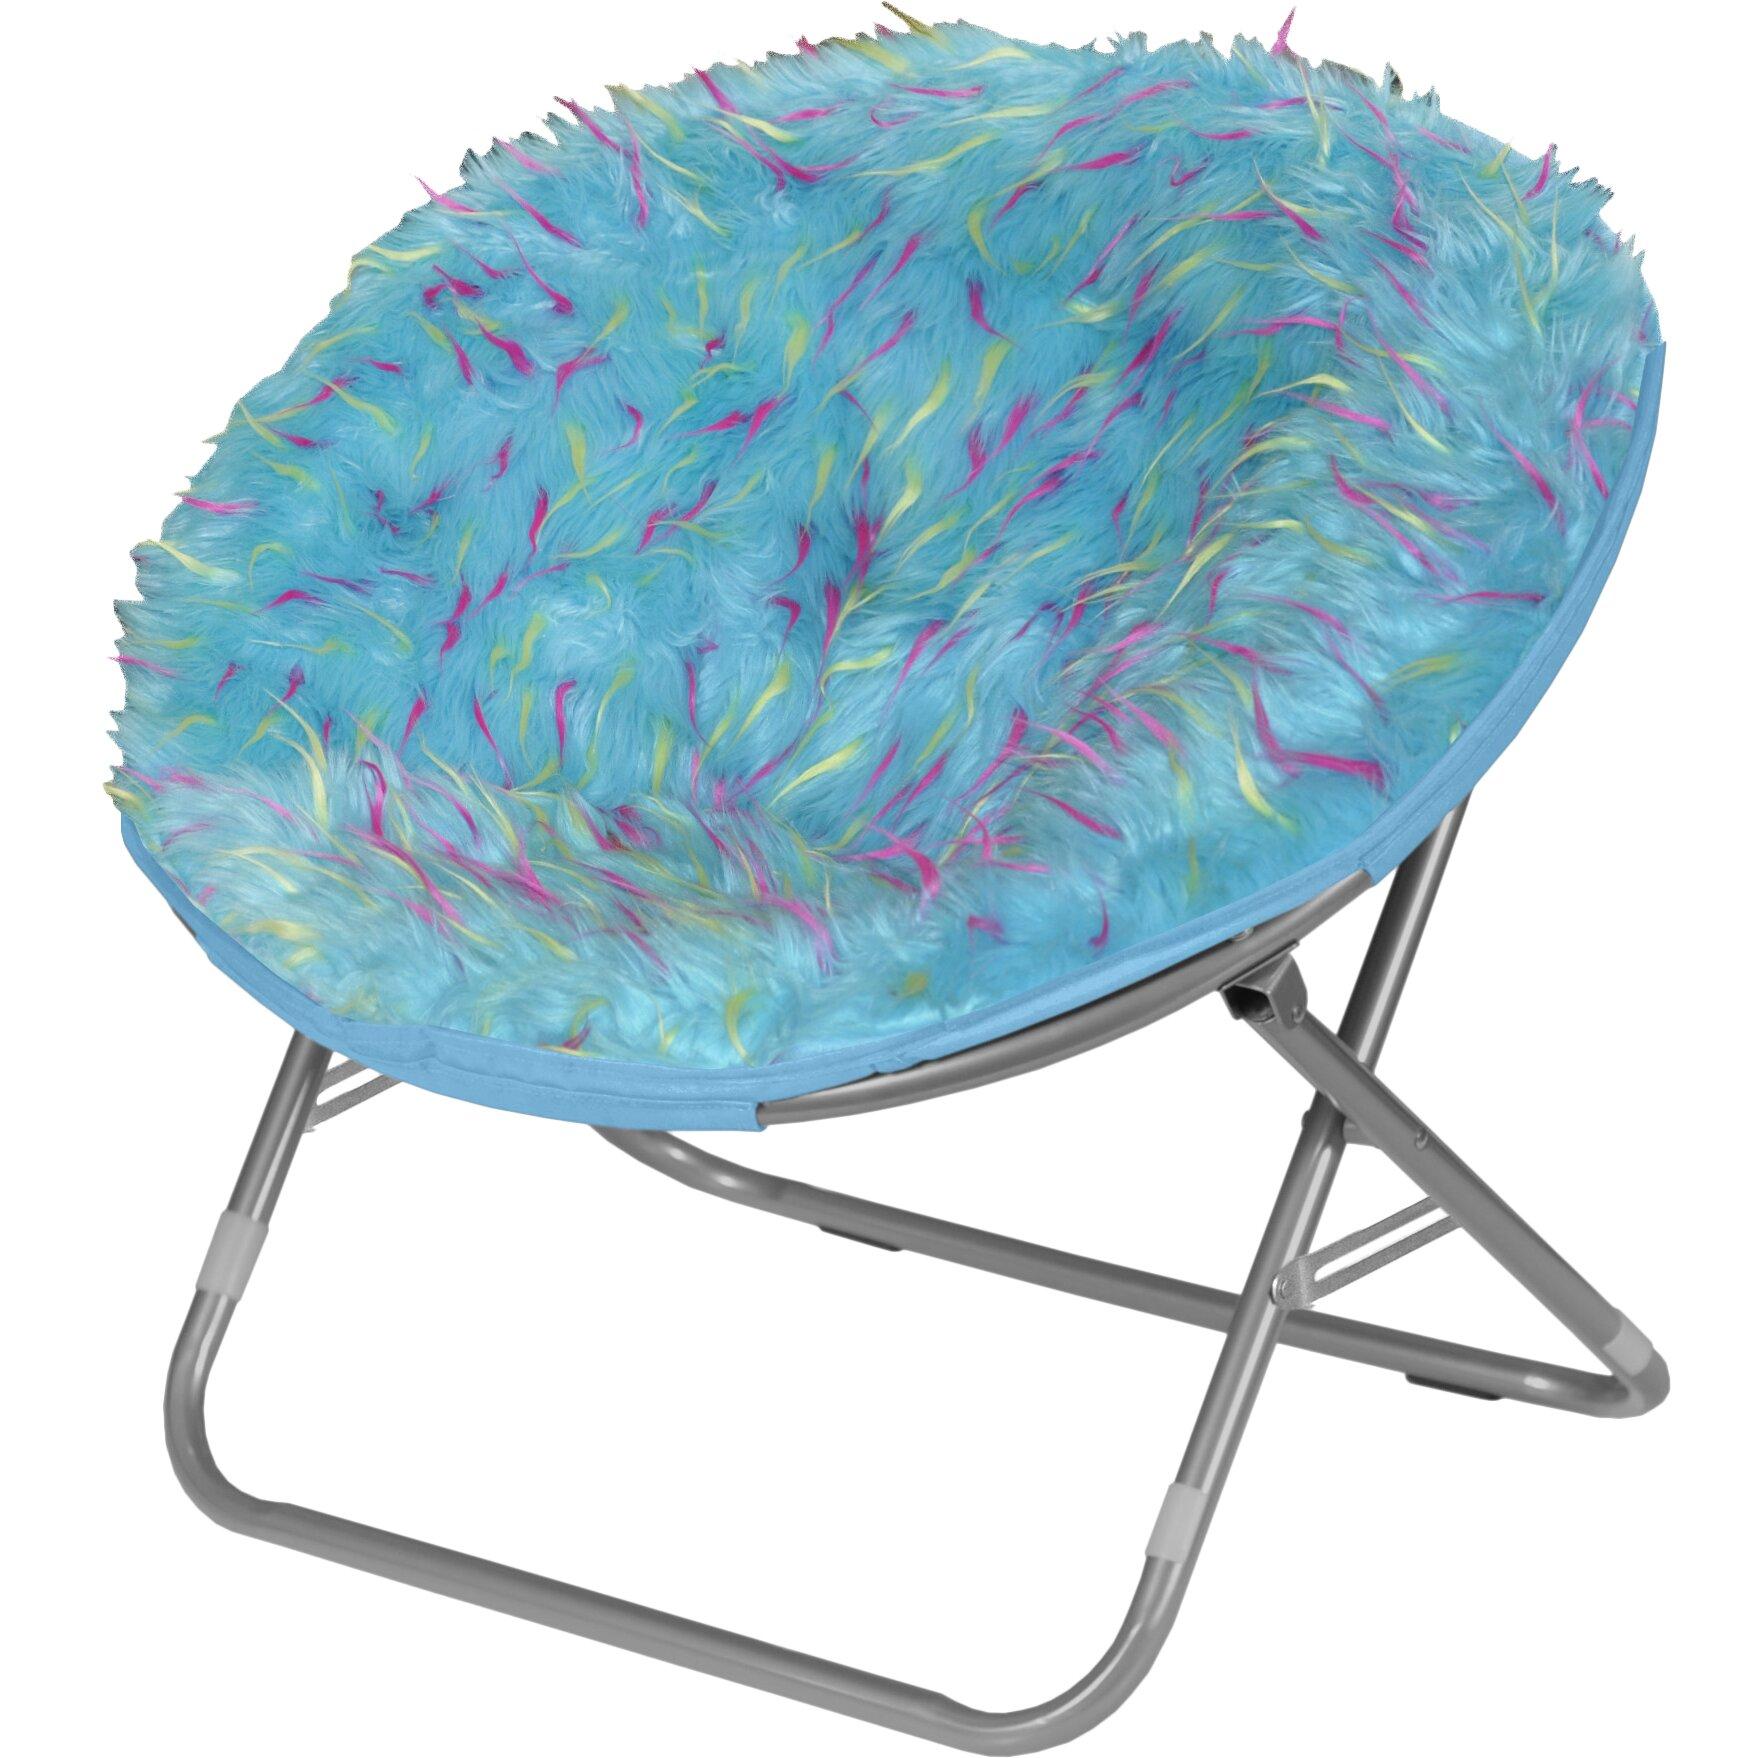 Idea Nuova Rock Your Room Spiker Faux Fur Saucer Papasan